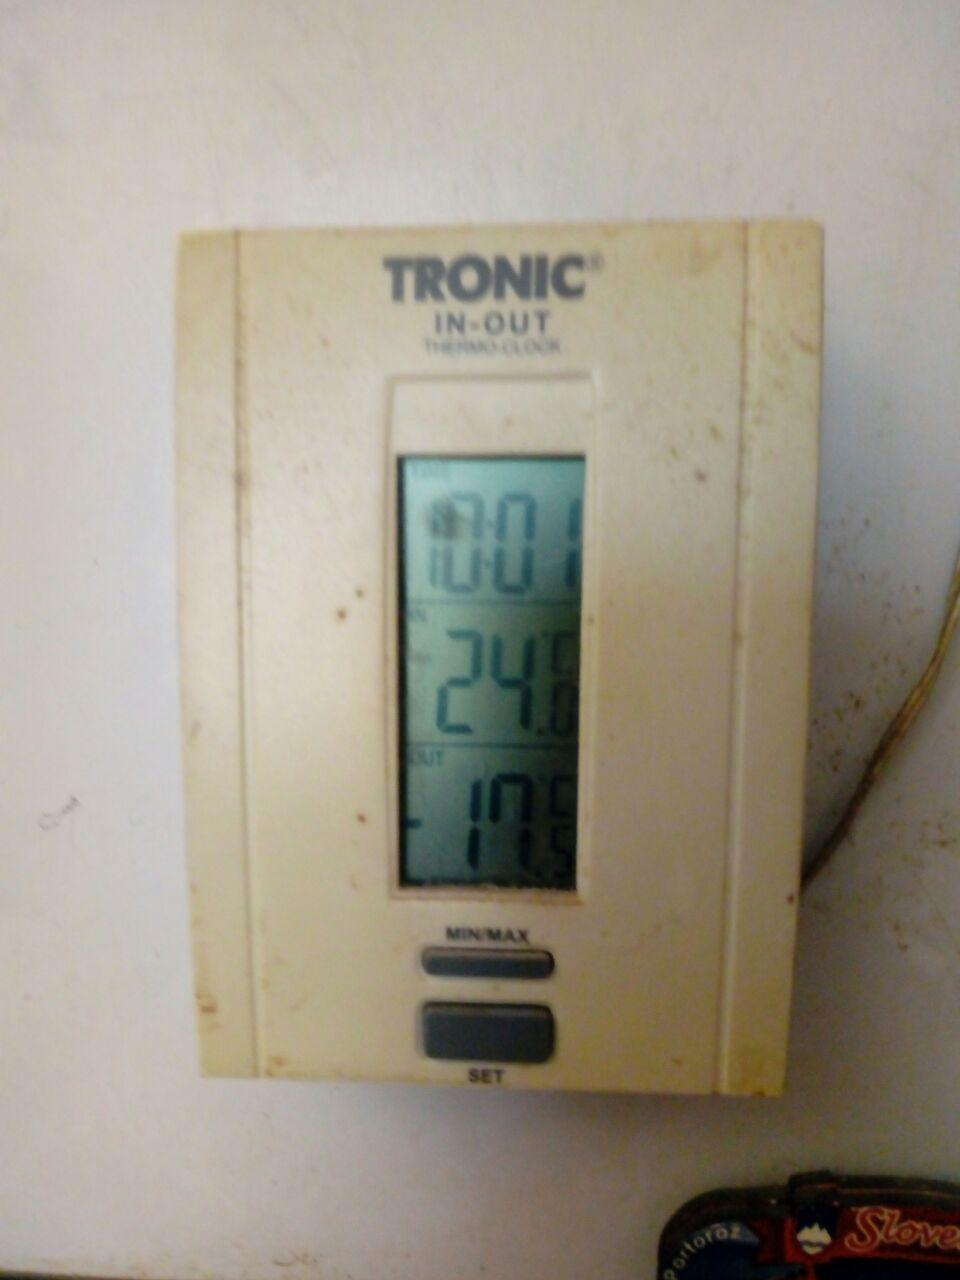 http://www.energialternativa.info/public/newforum/ForumEA/U/termometro-surgelatore.jpg